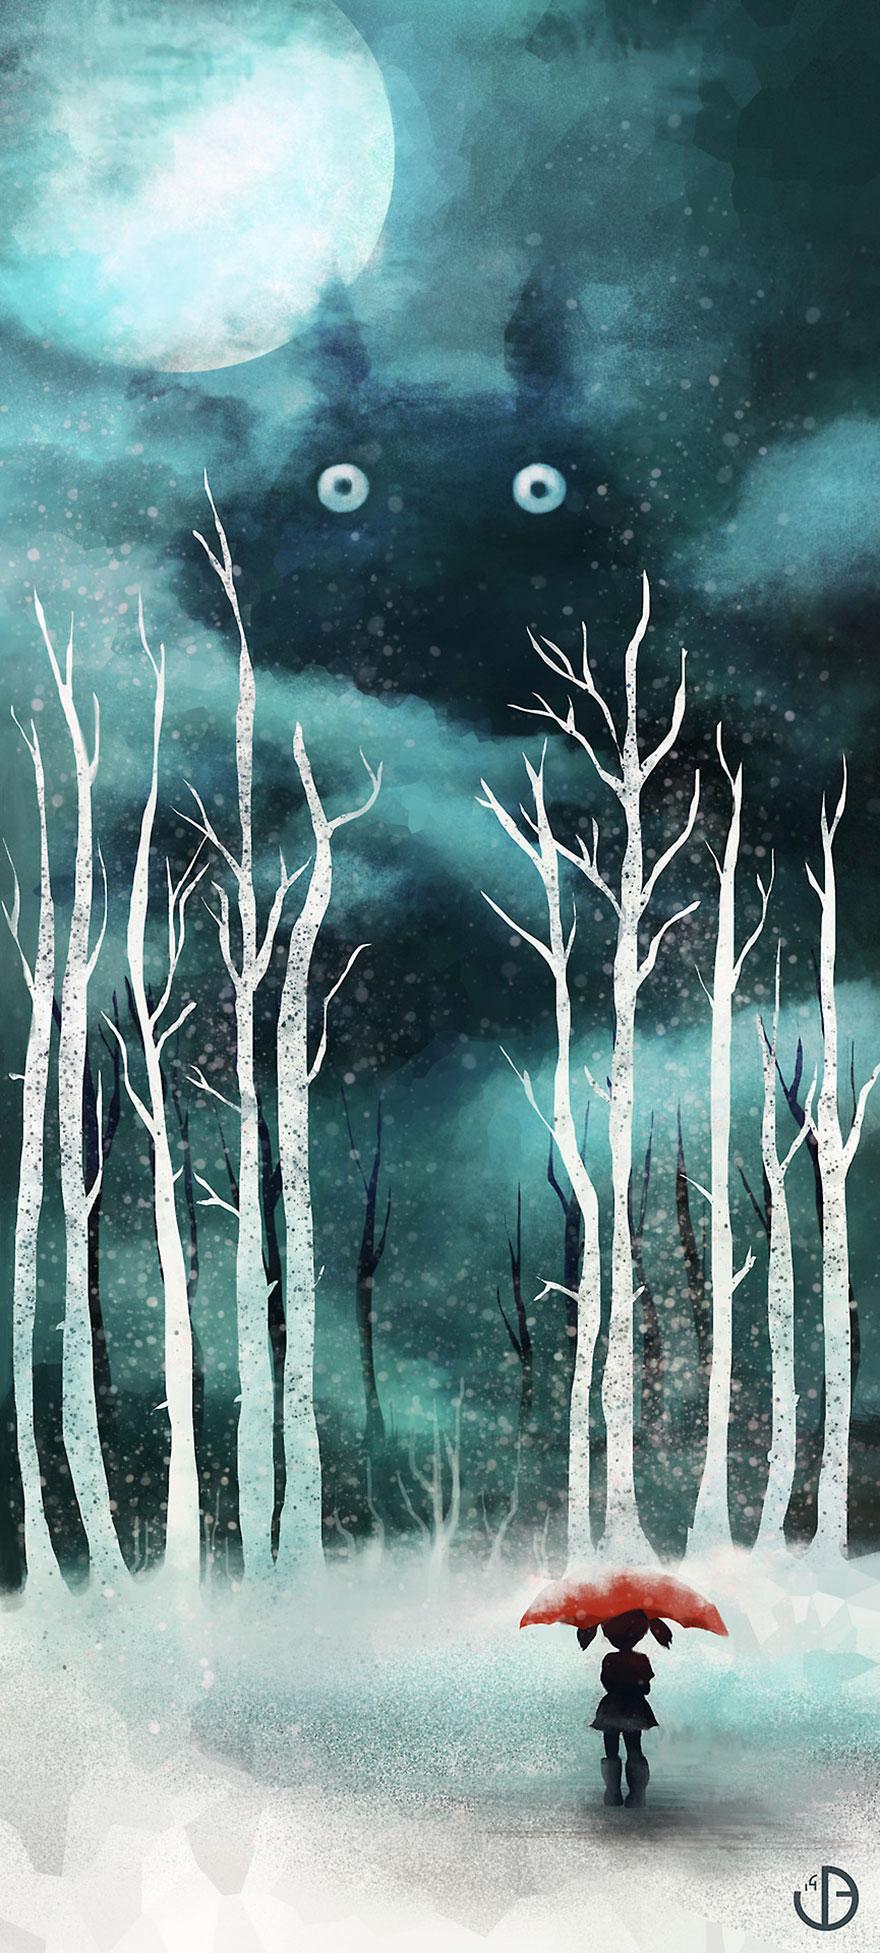 studio-ghibli-inspired-fan-art-paintings-oil-watercolor-74-58331c3443586__880